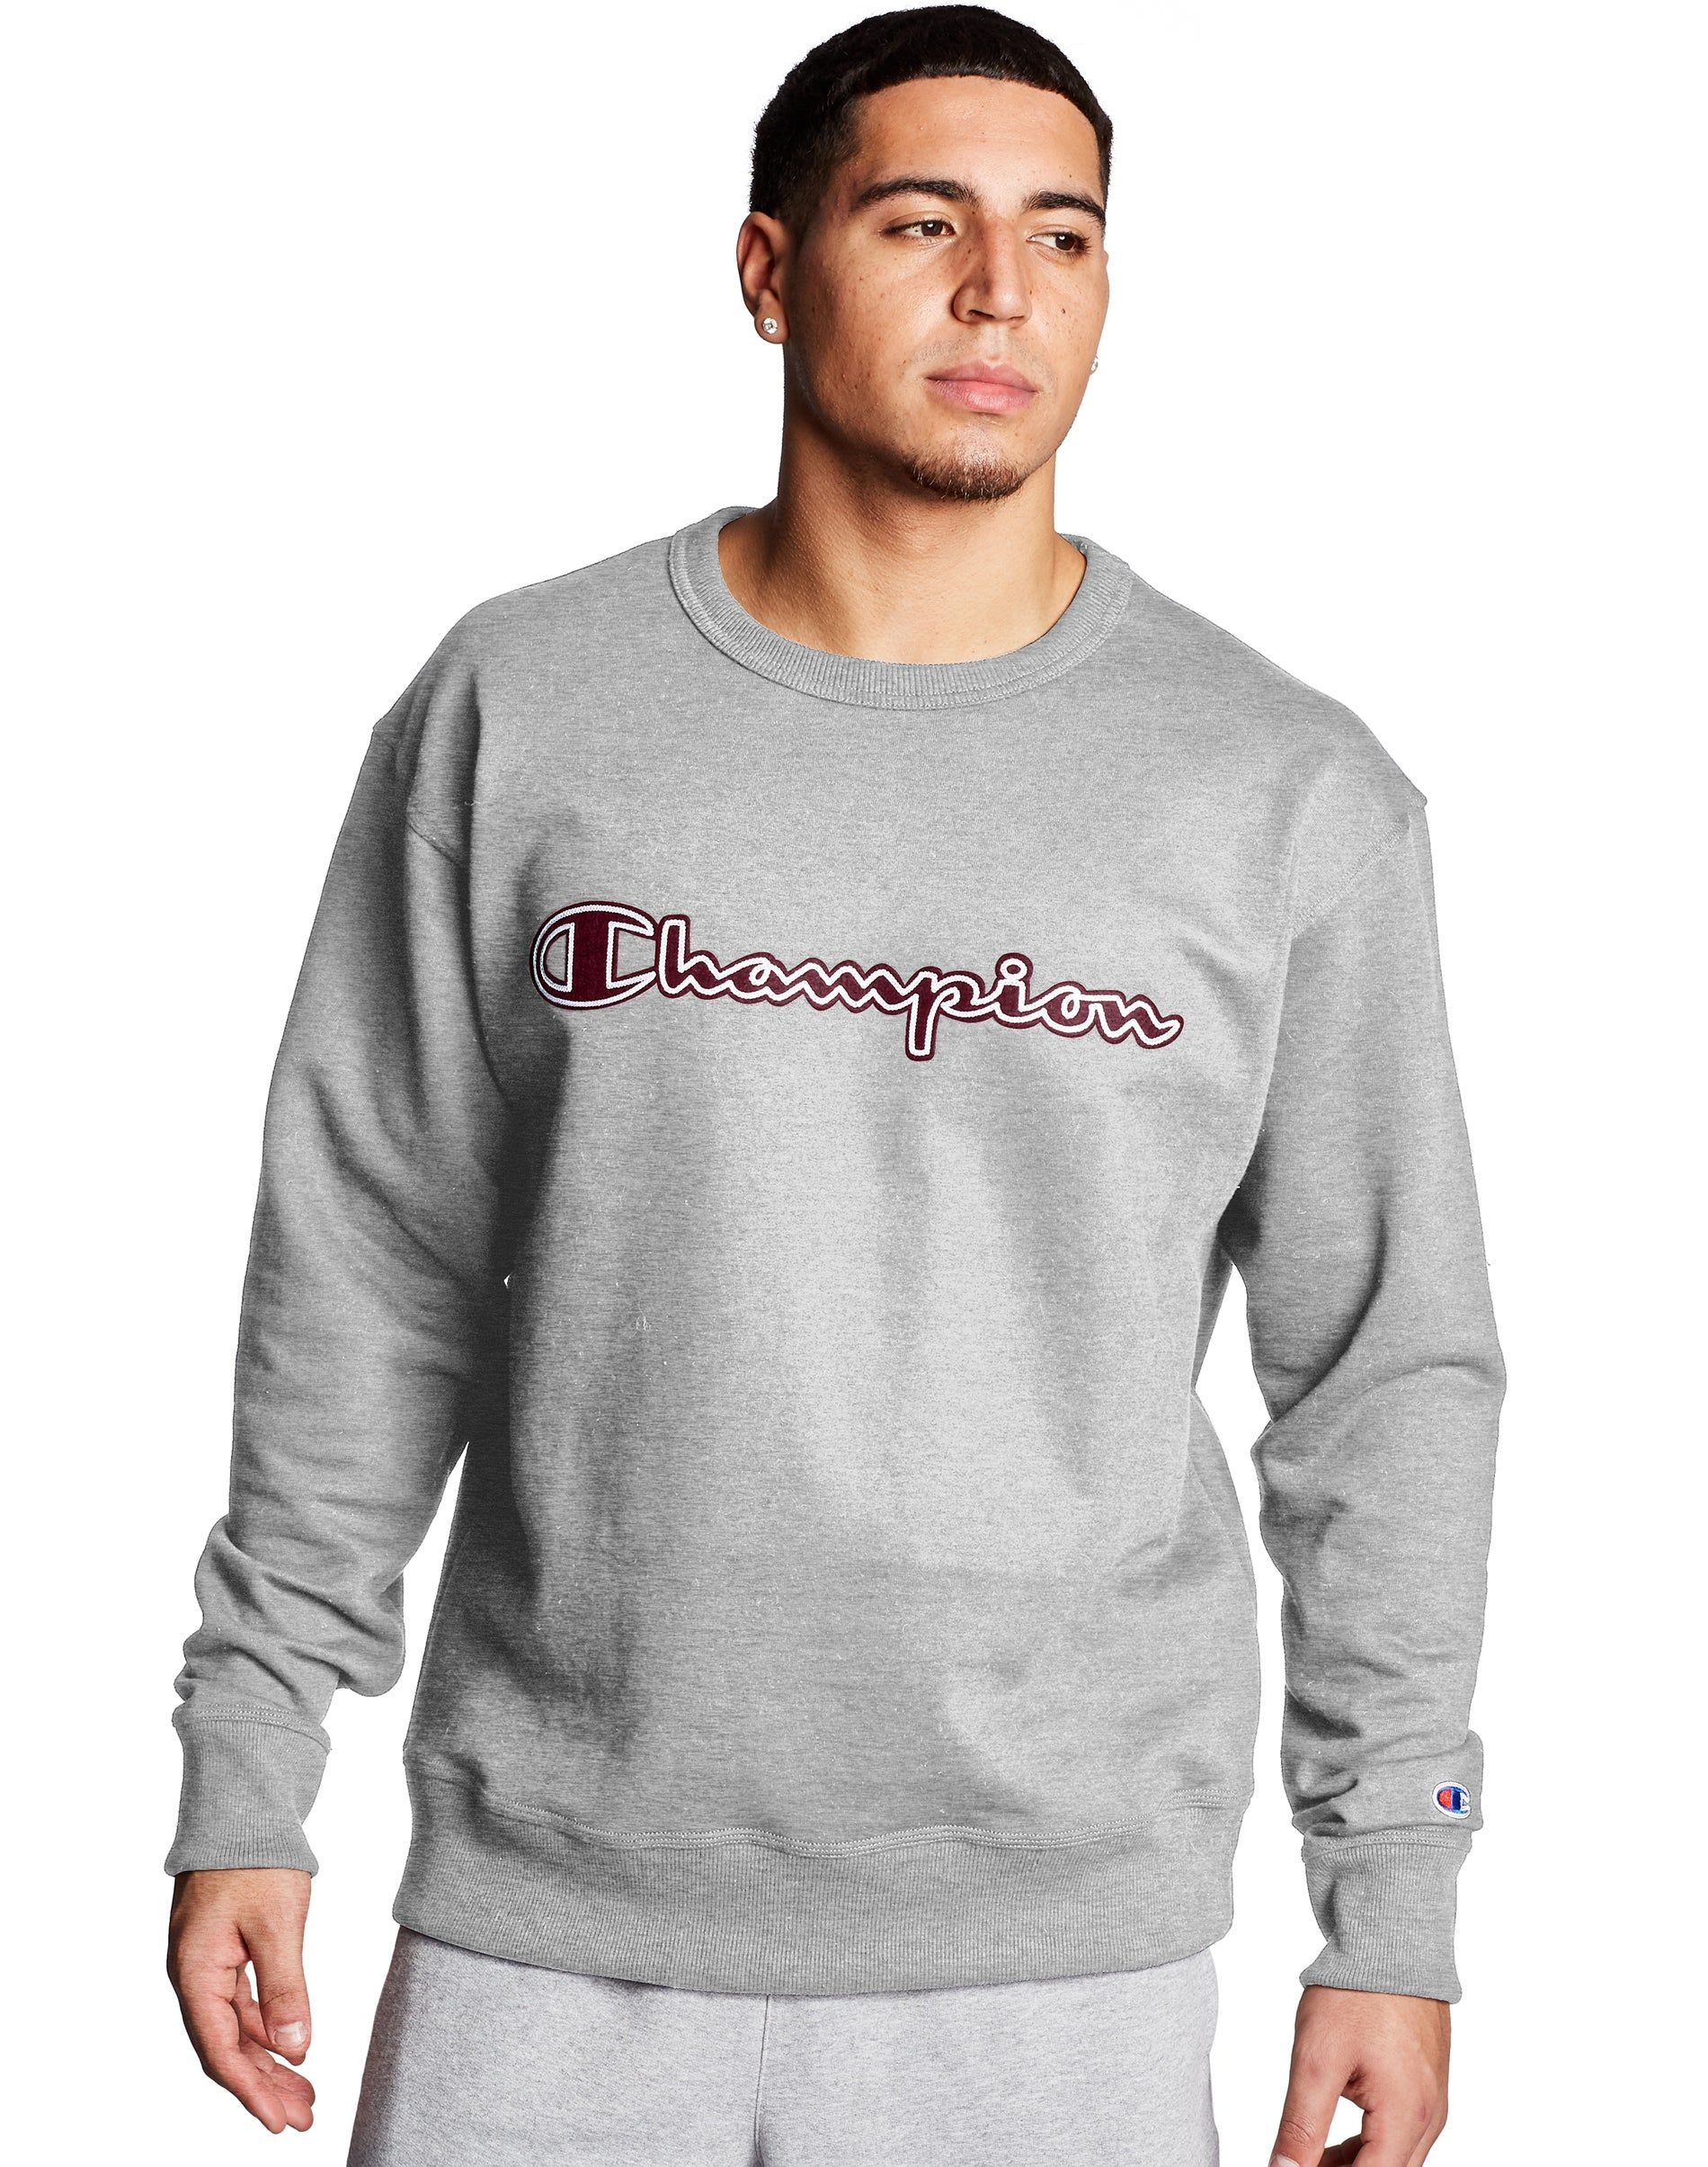 Champion Men S Athletics Powerblend Fleece Crew Logo With White Chainstitch Oxford Grey Sweatshirts Mens Champion Sweatshirt Crew Neck Sweatshirt [ 2410 x 1900 Pixel ]